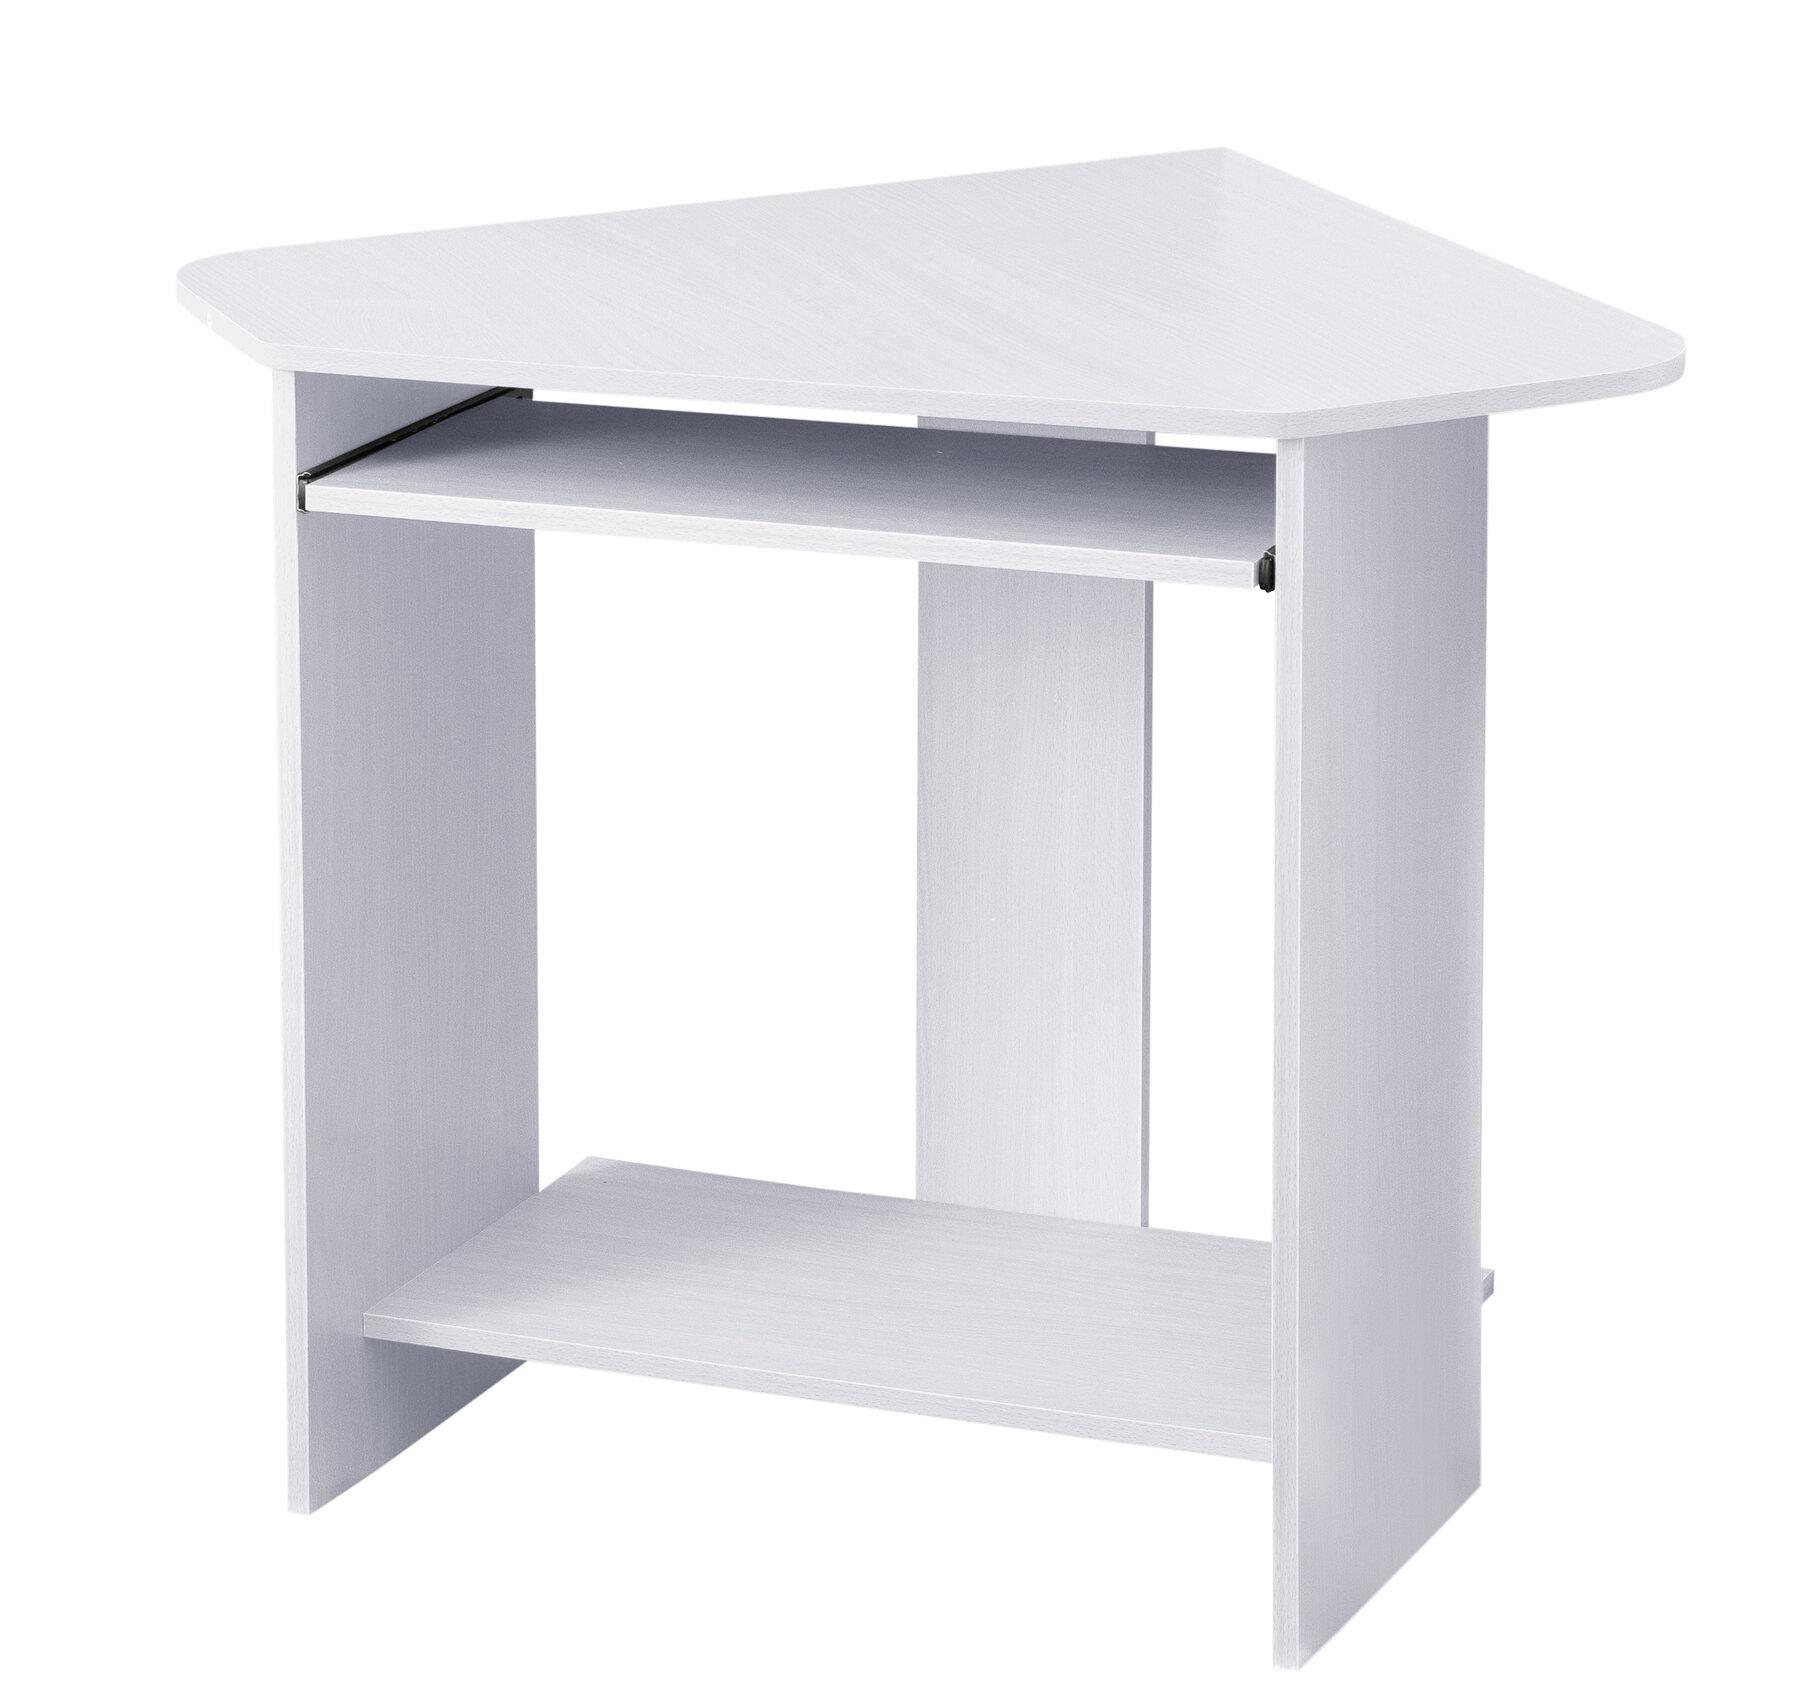 Superbe Computer White Corner Desks Youu0027ll Love In 2019 | Wayfair